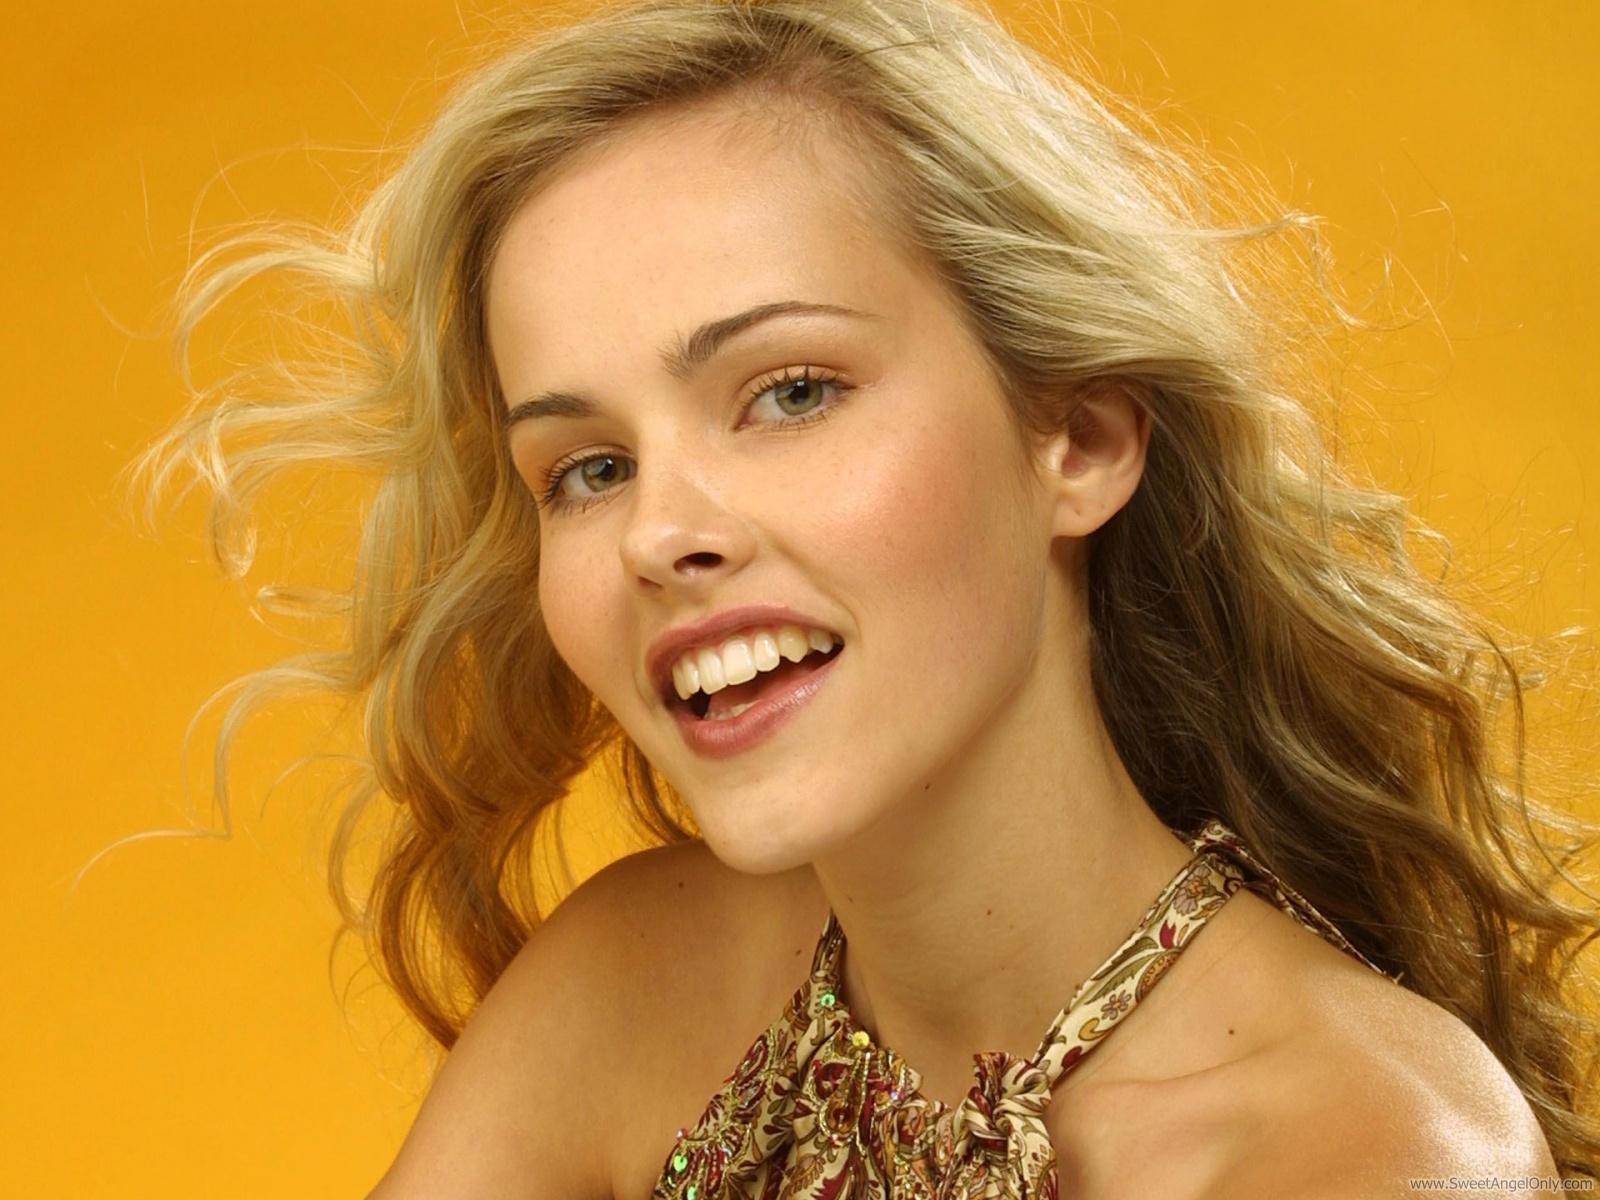 http://3.bp.blogspot.com/-ZHB4pMNn5_k/Tqwe8F7Qe2I/AAAAAAAAJLU/B7ayyUIwiF8/s1600/daybreakers_actress_isabel_lucas_wallpaper-1600x1200.jpg